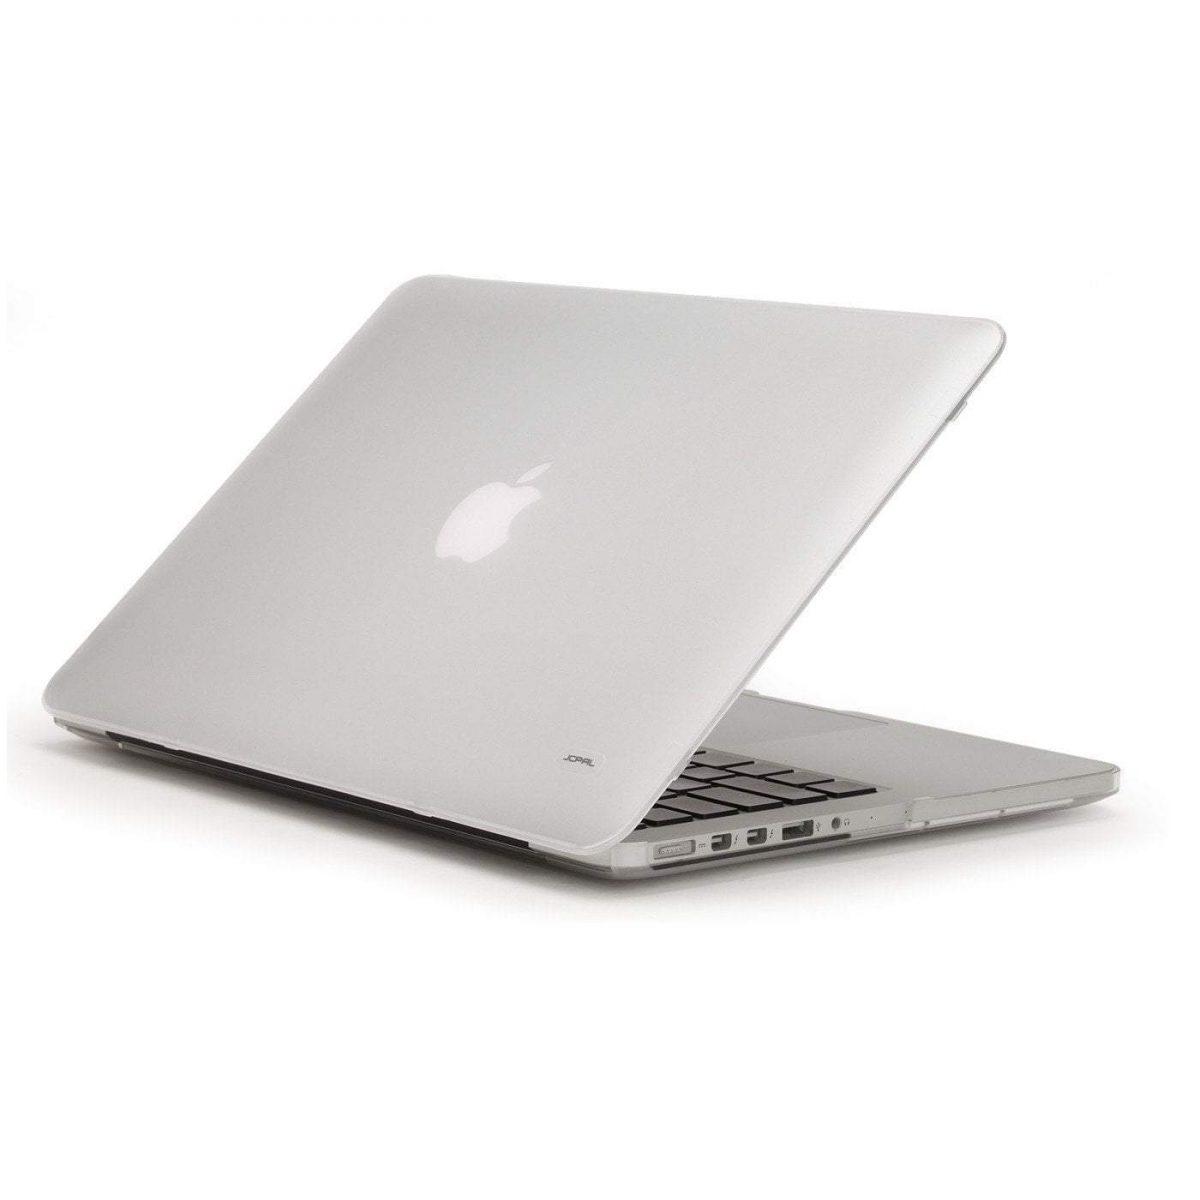 jcpal case macguard ultra thin protective case for macbook pro retina matte macbook pro retina 13 crystal 3433249411 2048x 1200x1200 محافظ مک بوک پرو رتینا رنگ مات جی سی پال | فروشگاه اینترنتی آی تی پخش